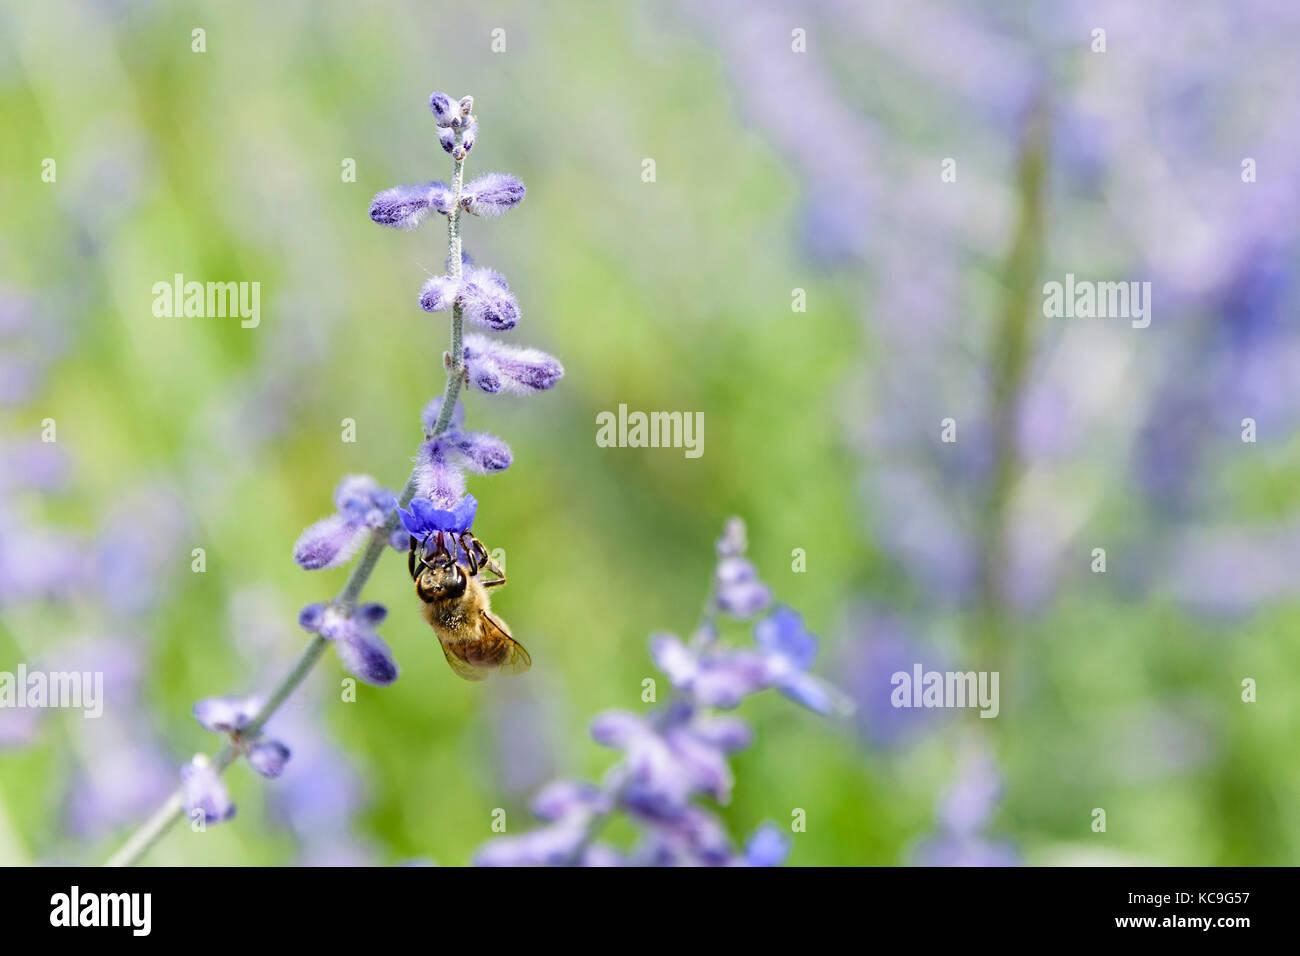 Close-up de abeja pie boca abajo y recogiendo polen de flores de salvia rusa o perovskia atriplicifolia Foto de stock